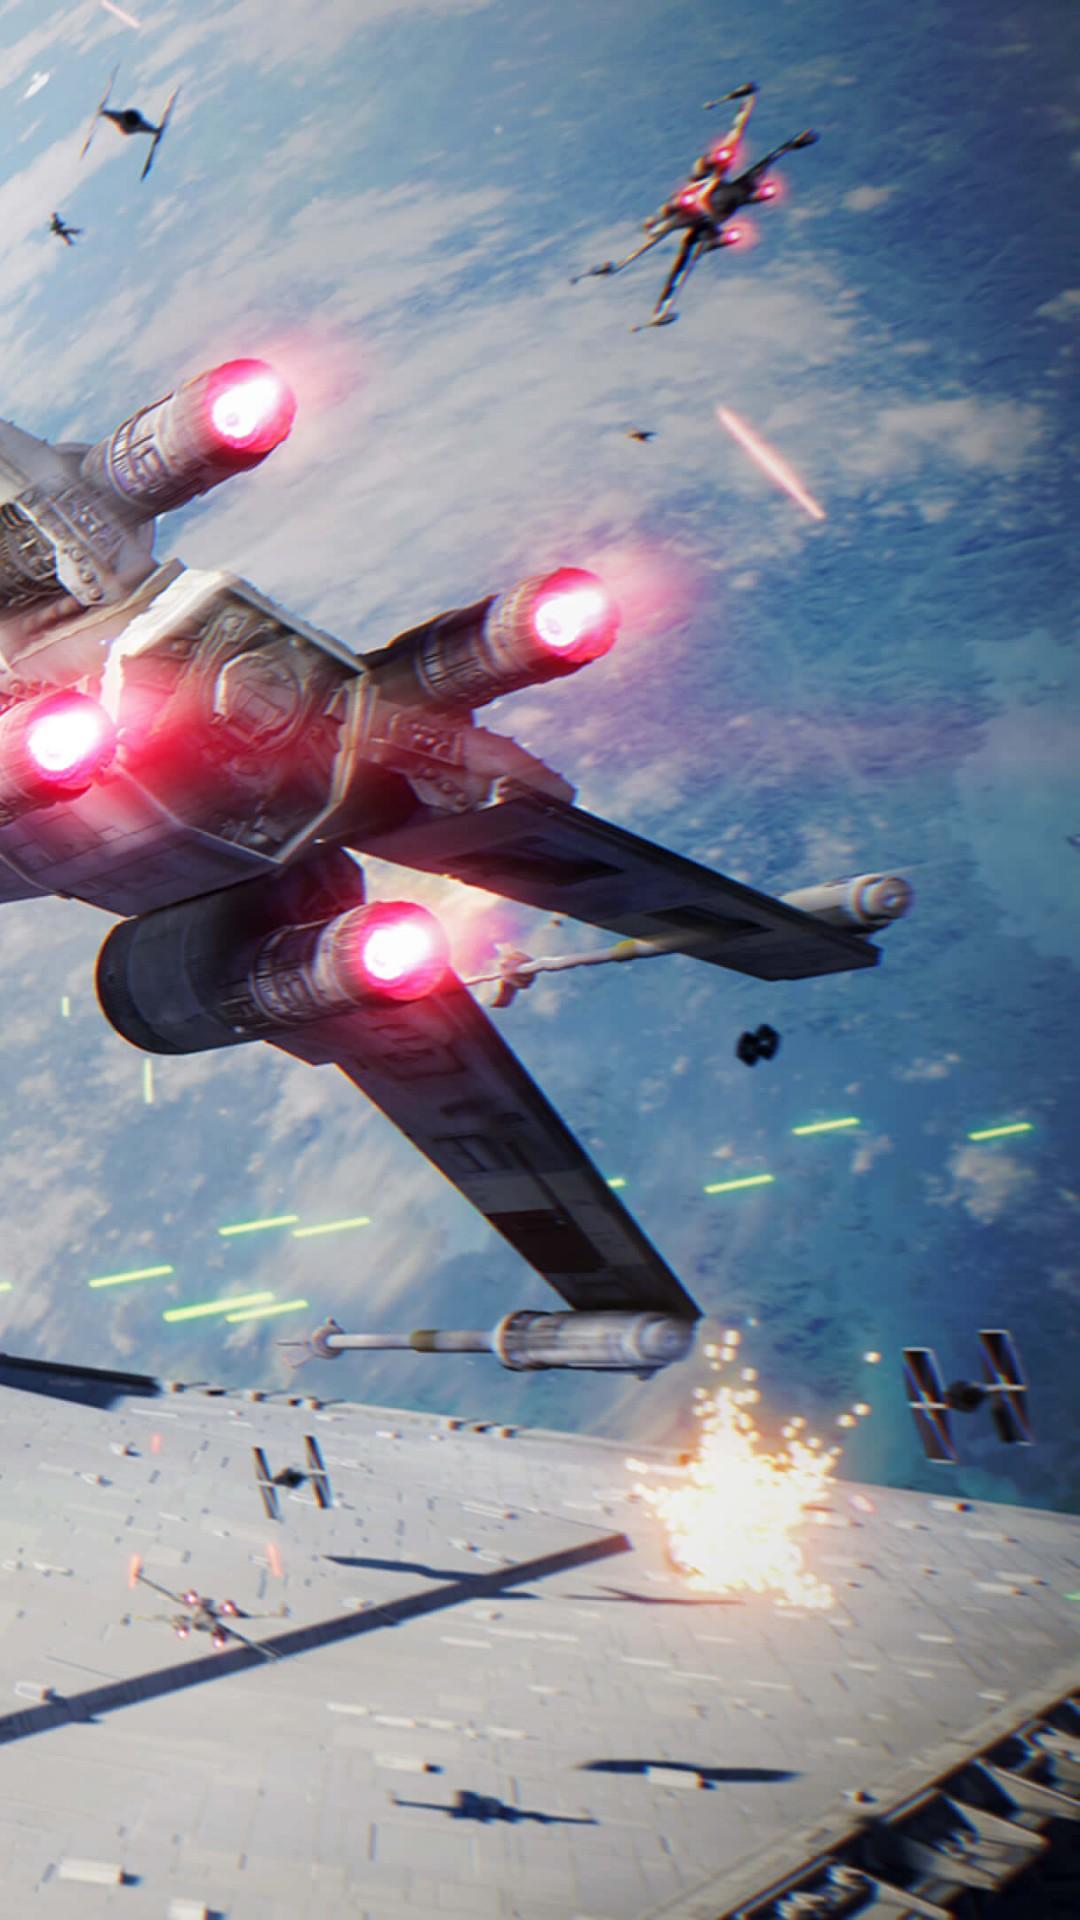 Wallpaper Star Wars Battlefront Ii 4k Screenshot Games